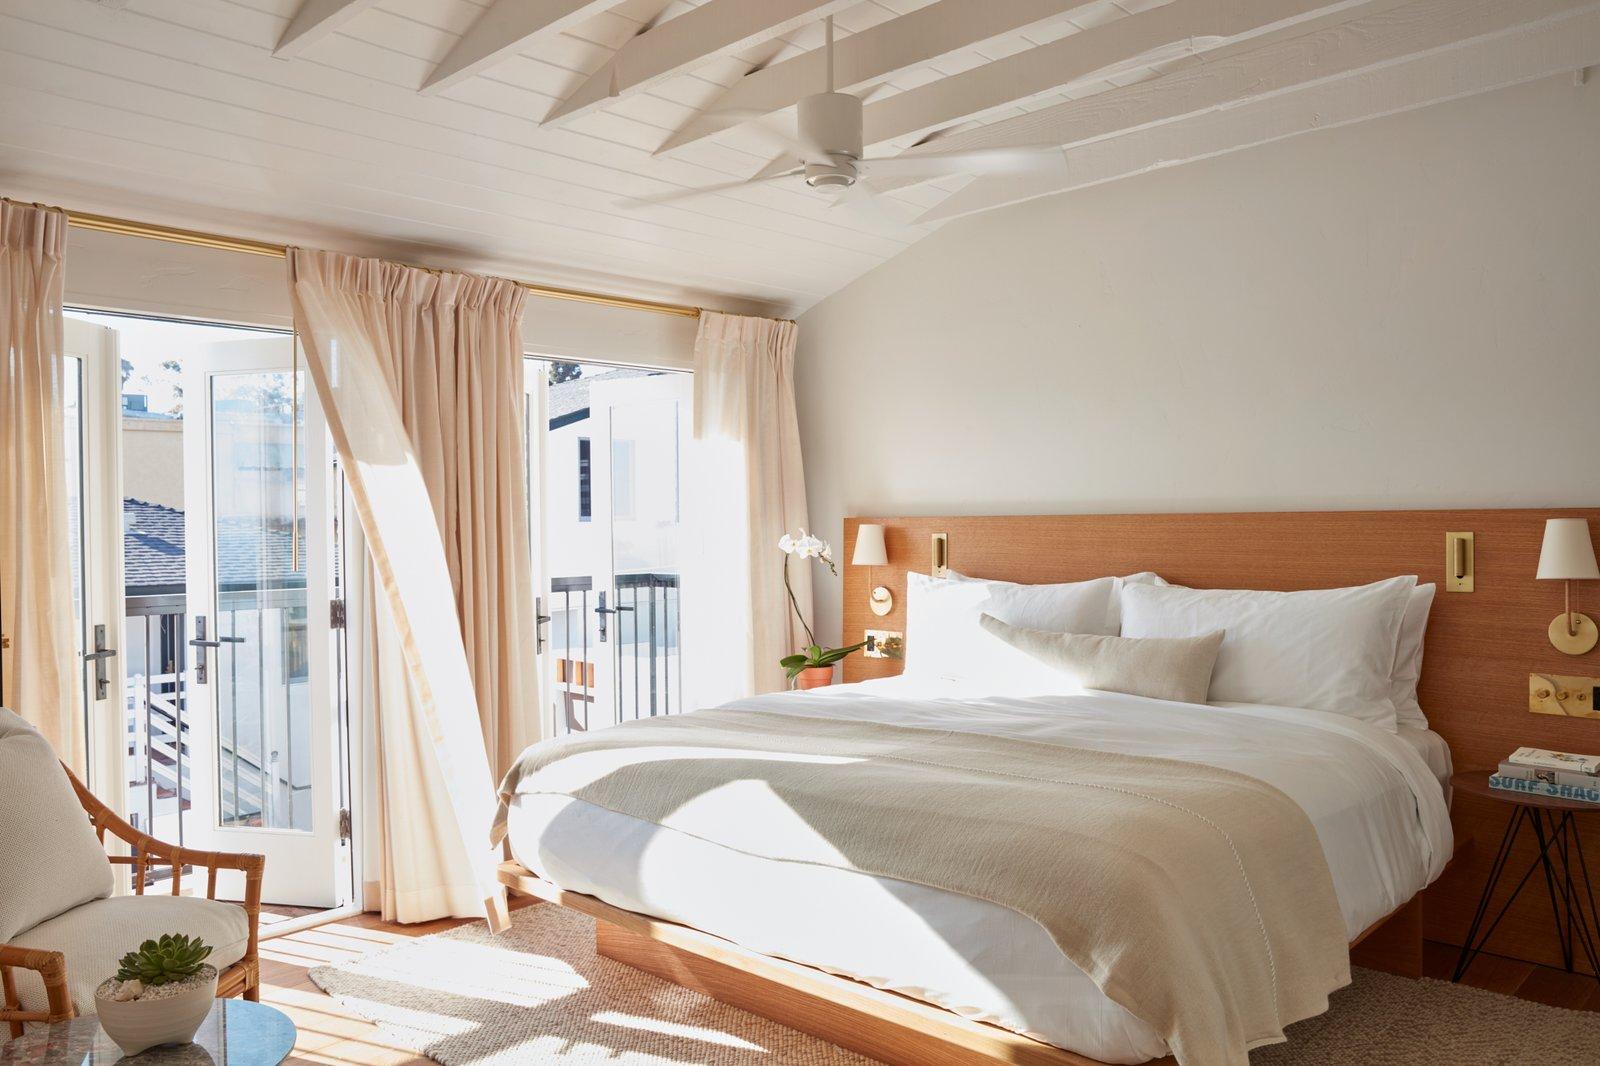 Hotel Joaquin Soleil room